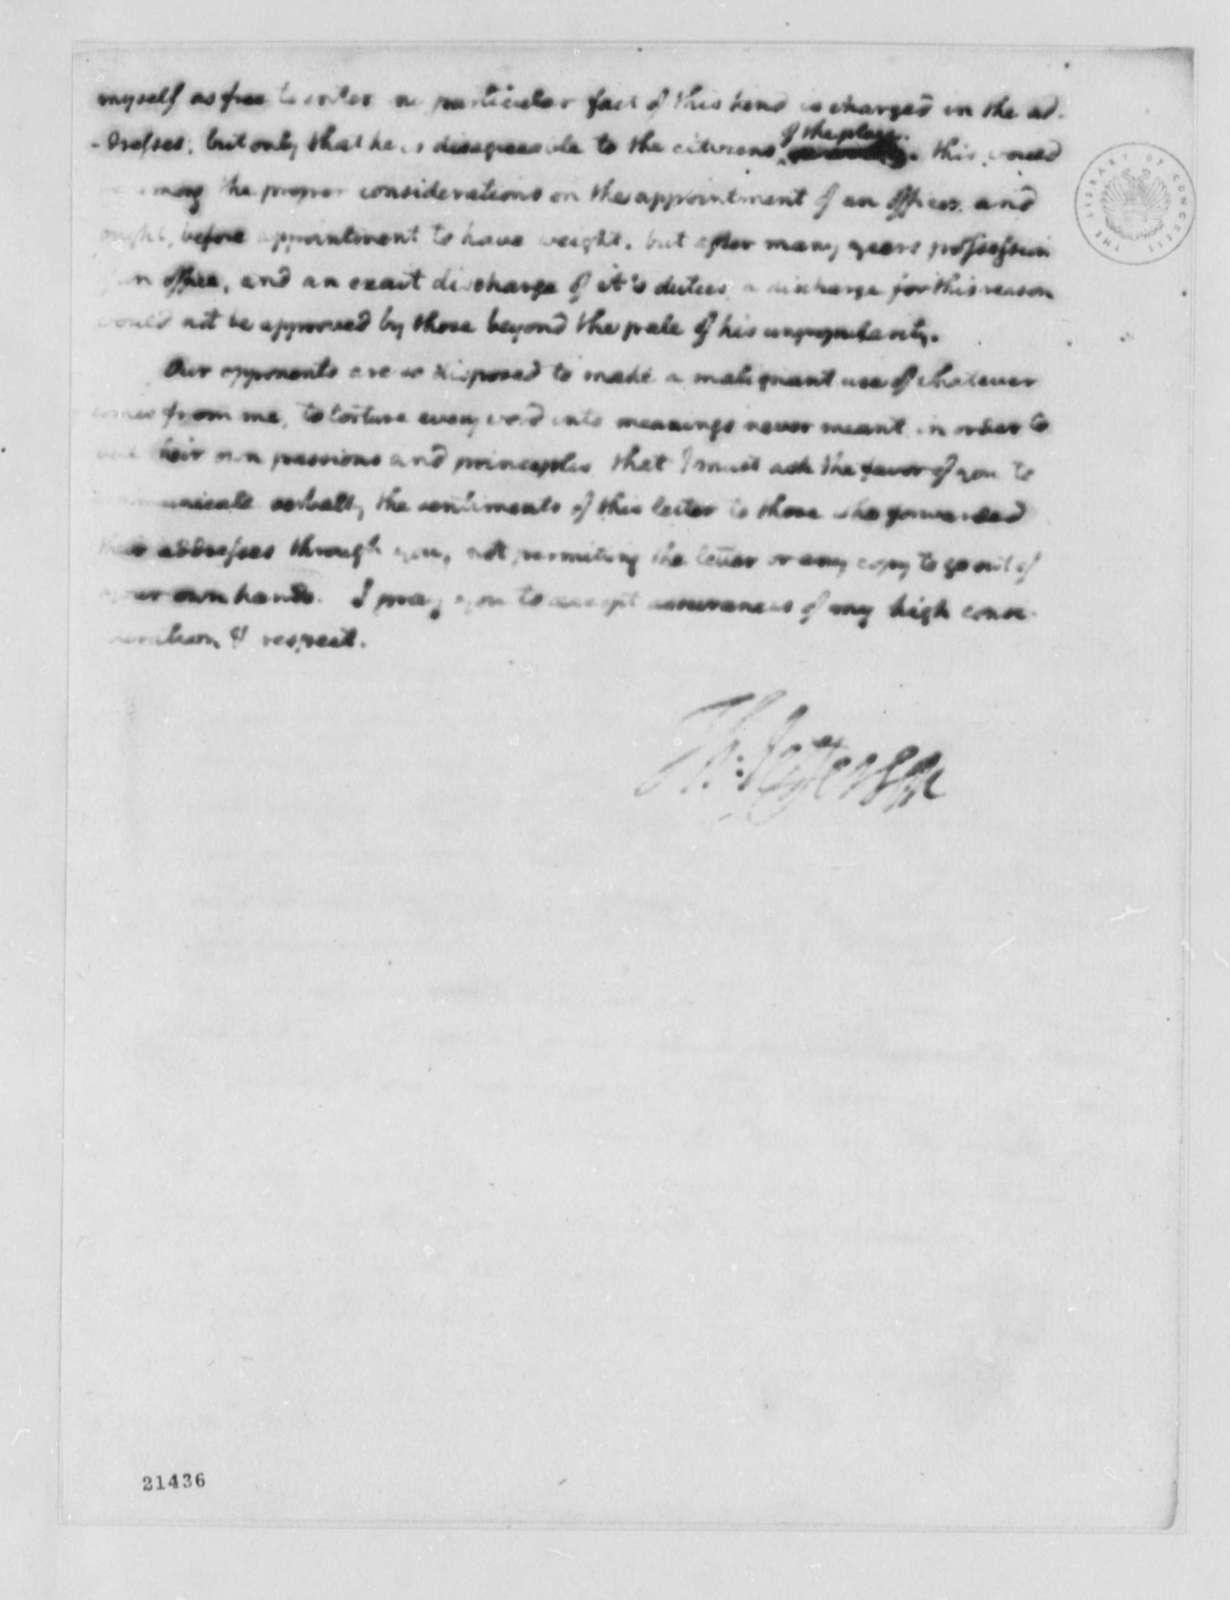 Thomas Jefferson to David Hall, July 6, 1802